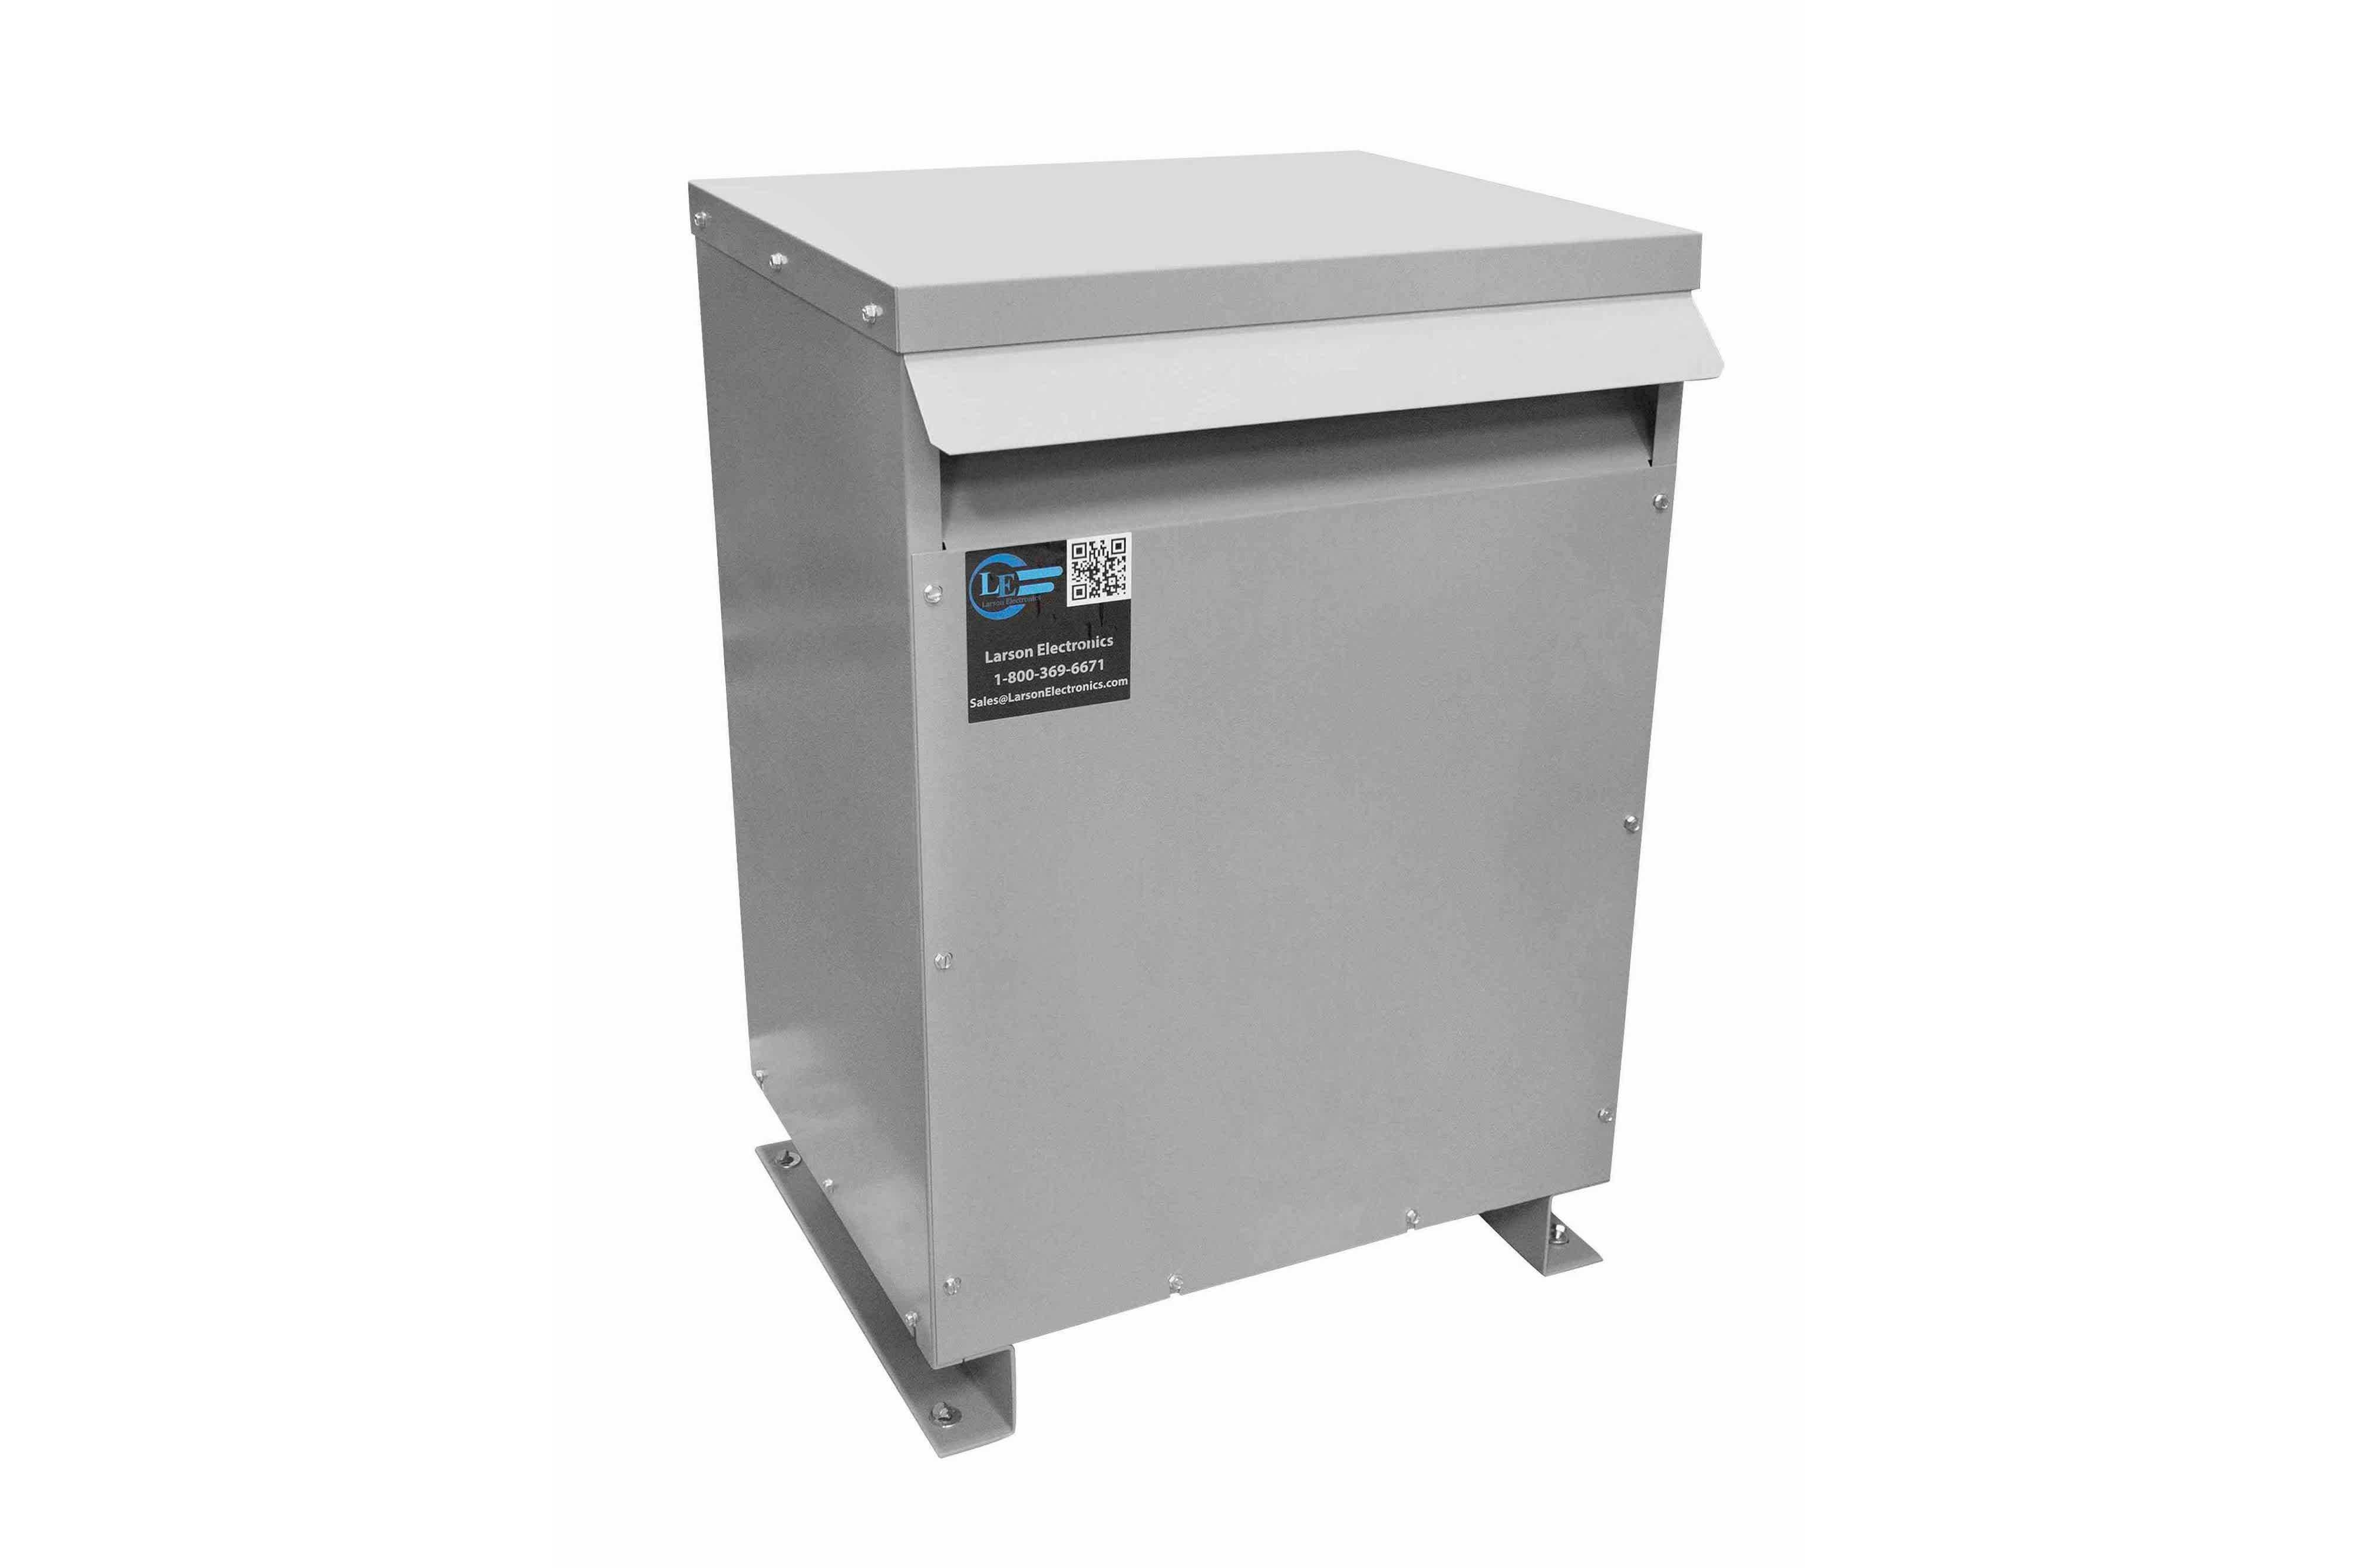 28 kVA 3PH Isolation Transformer, 380V Wye Primary, 480V Delta Secondary, N3R, Ventilated, 60 Hz